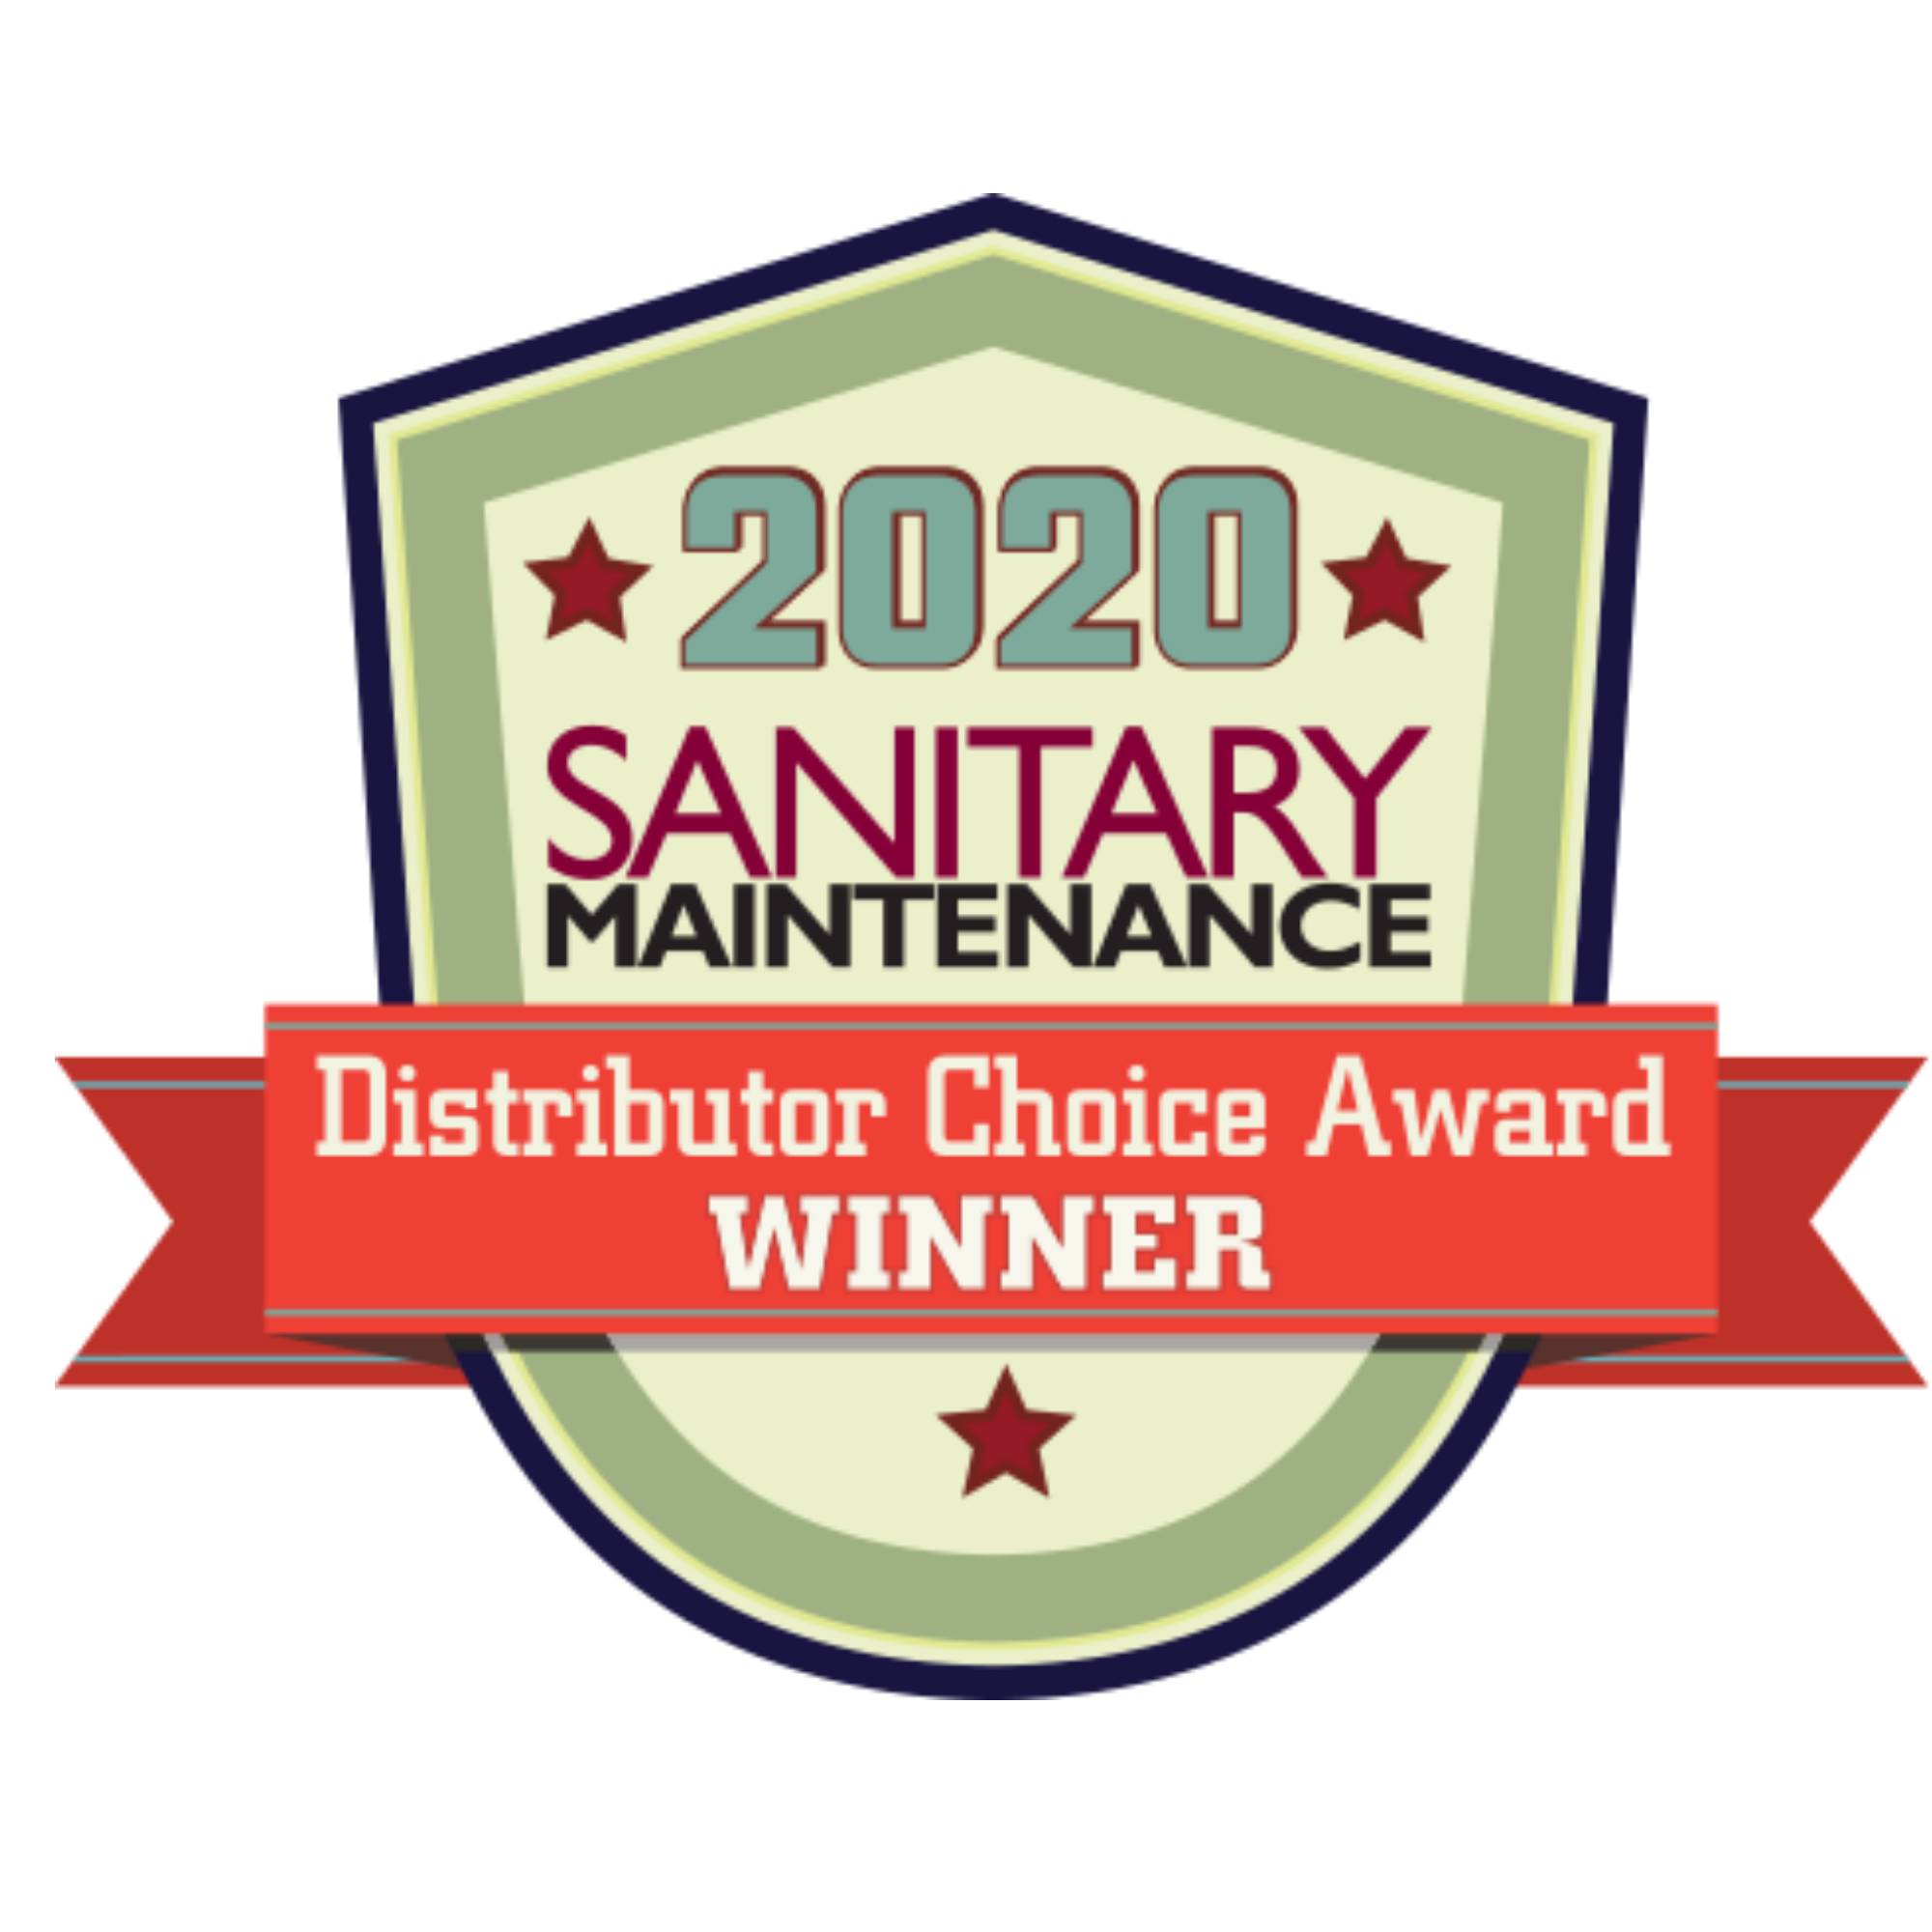 Sanitary Maintenance Award